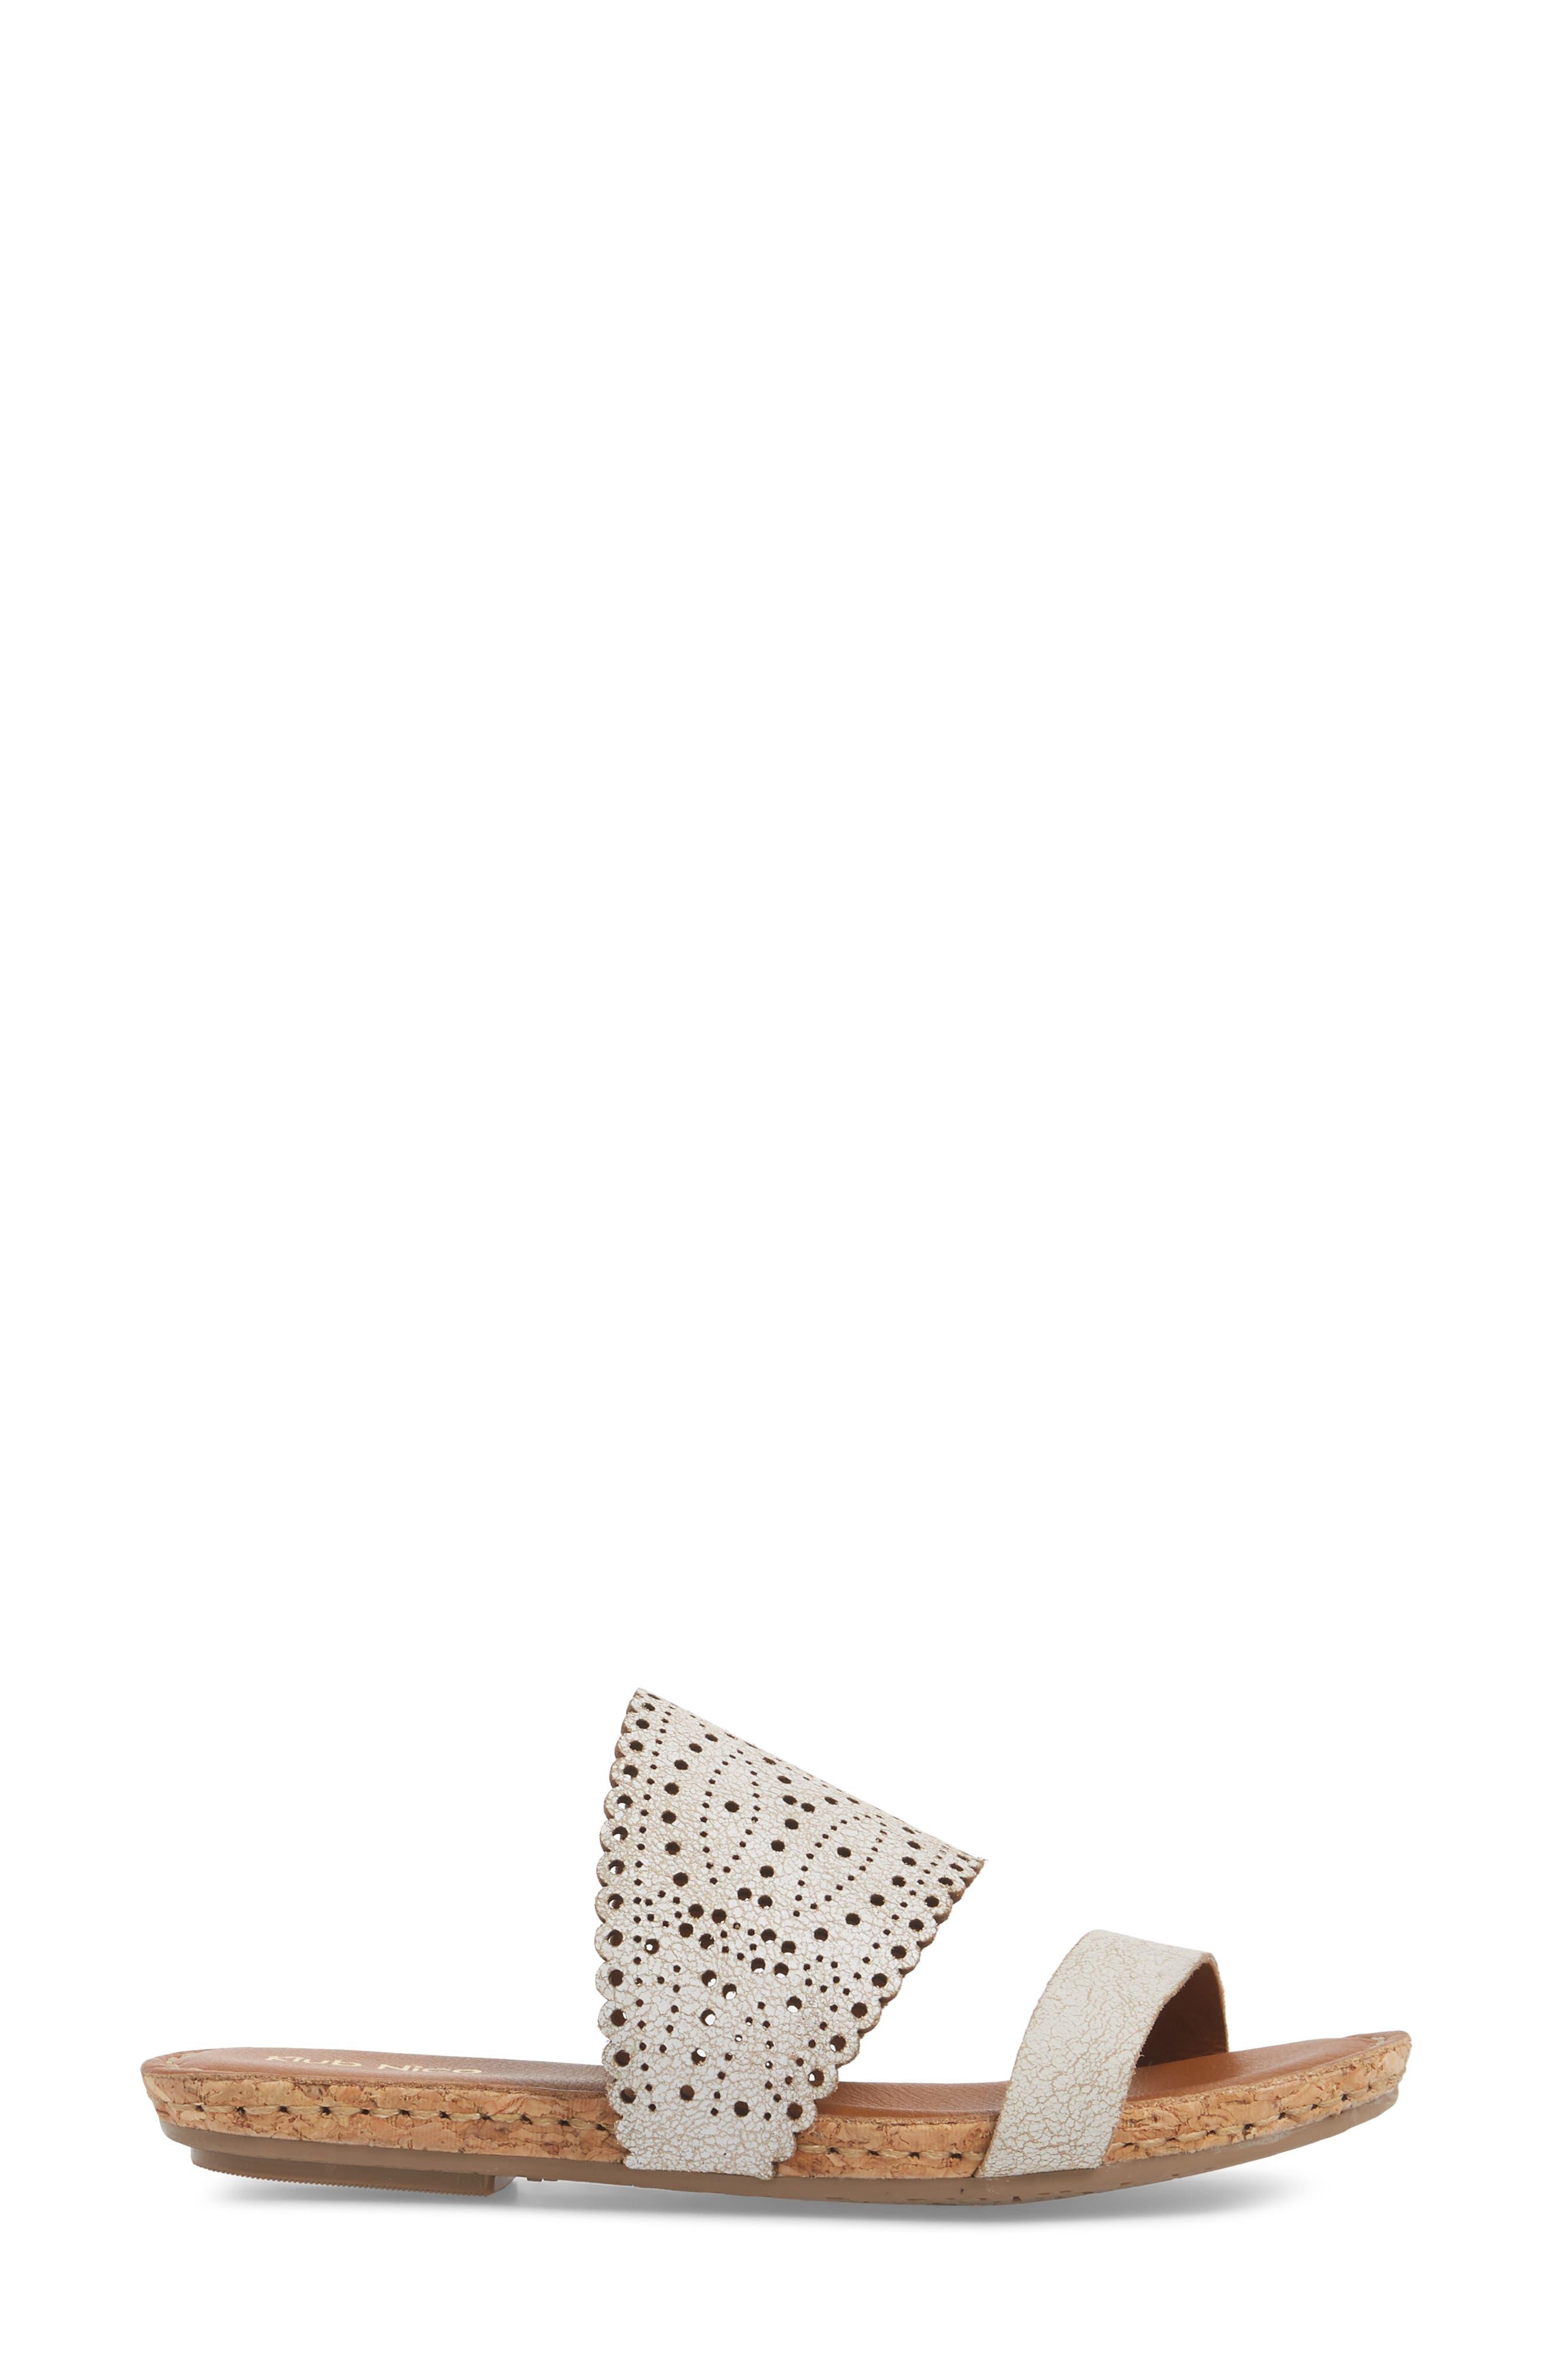 KLUB NICO, Ginette Perforated Slide Sandal, Alternate thumbnail 3, color, WHITE LEATHER